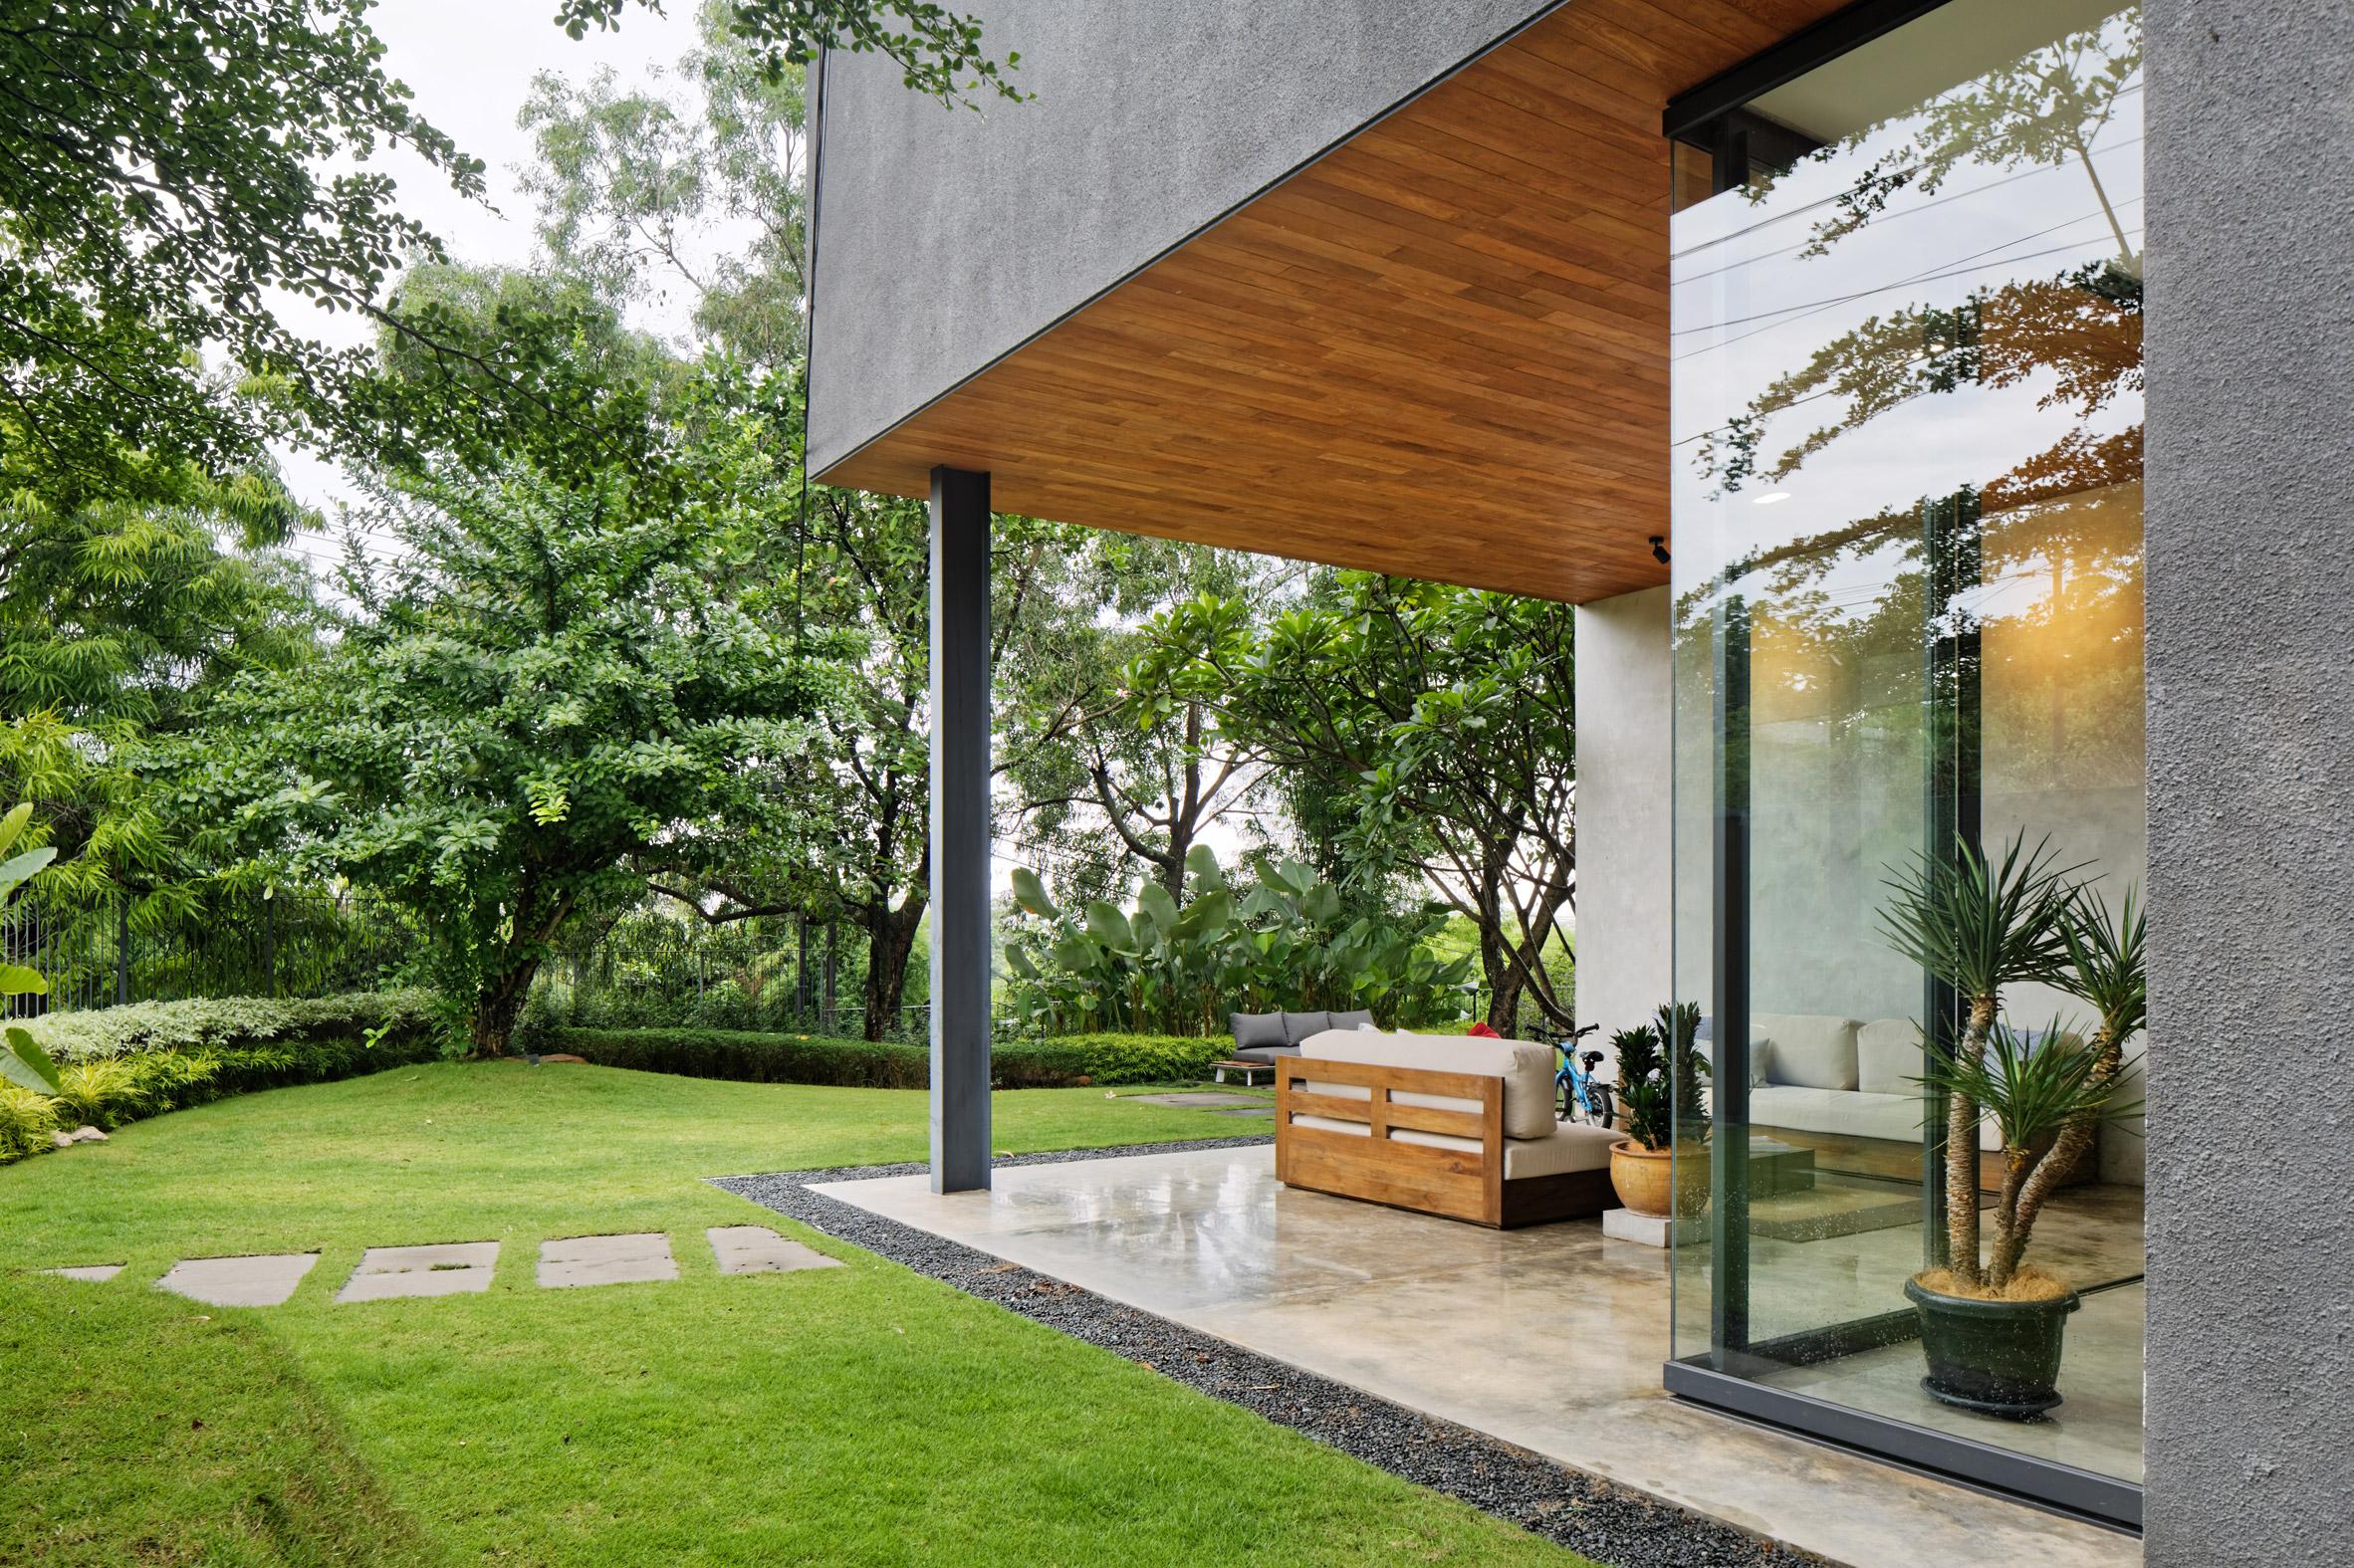 house-inside-outside-tamara-wibowo-architecture-residential-indonesia_dezeen_2364_col_14.jpg